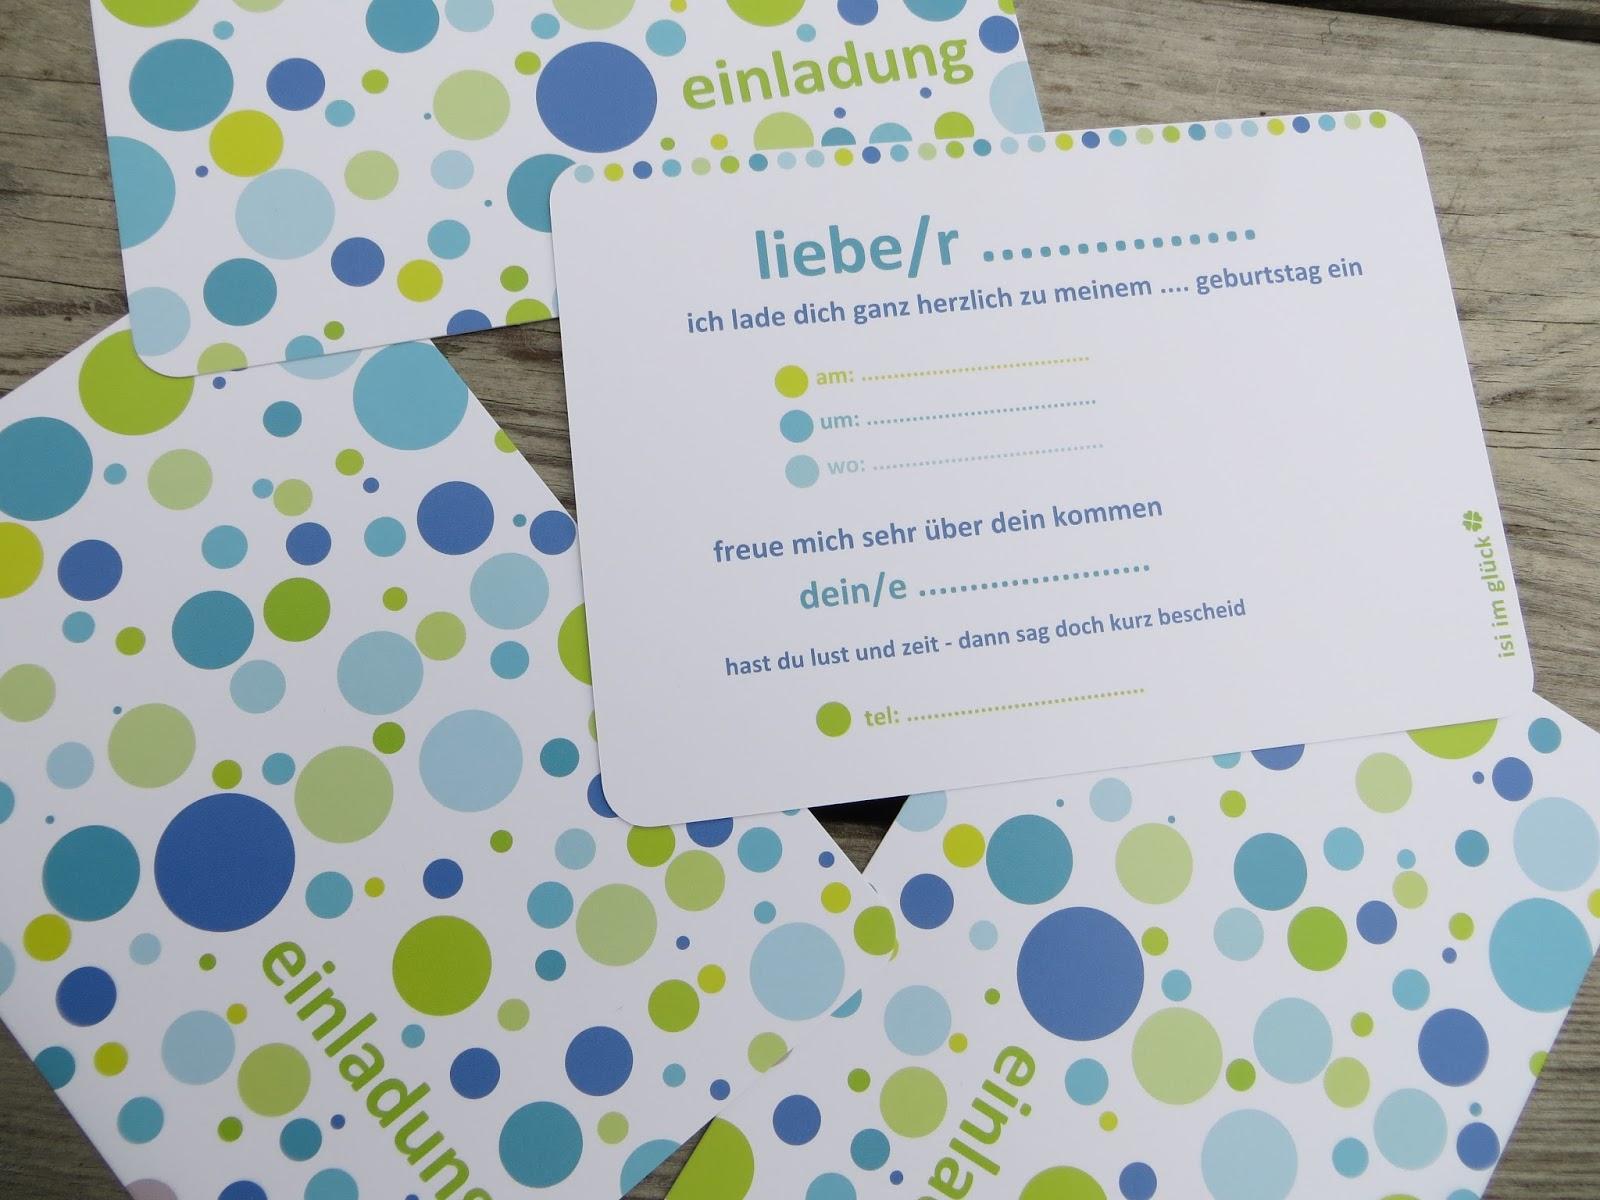 http://de.dawanda.com/product/47037182-PUNKT-LADUNG-geburtstag-4er-set-blaugruen